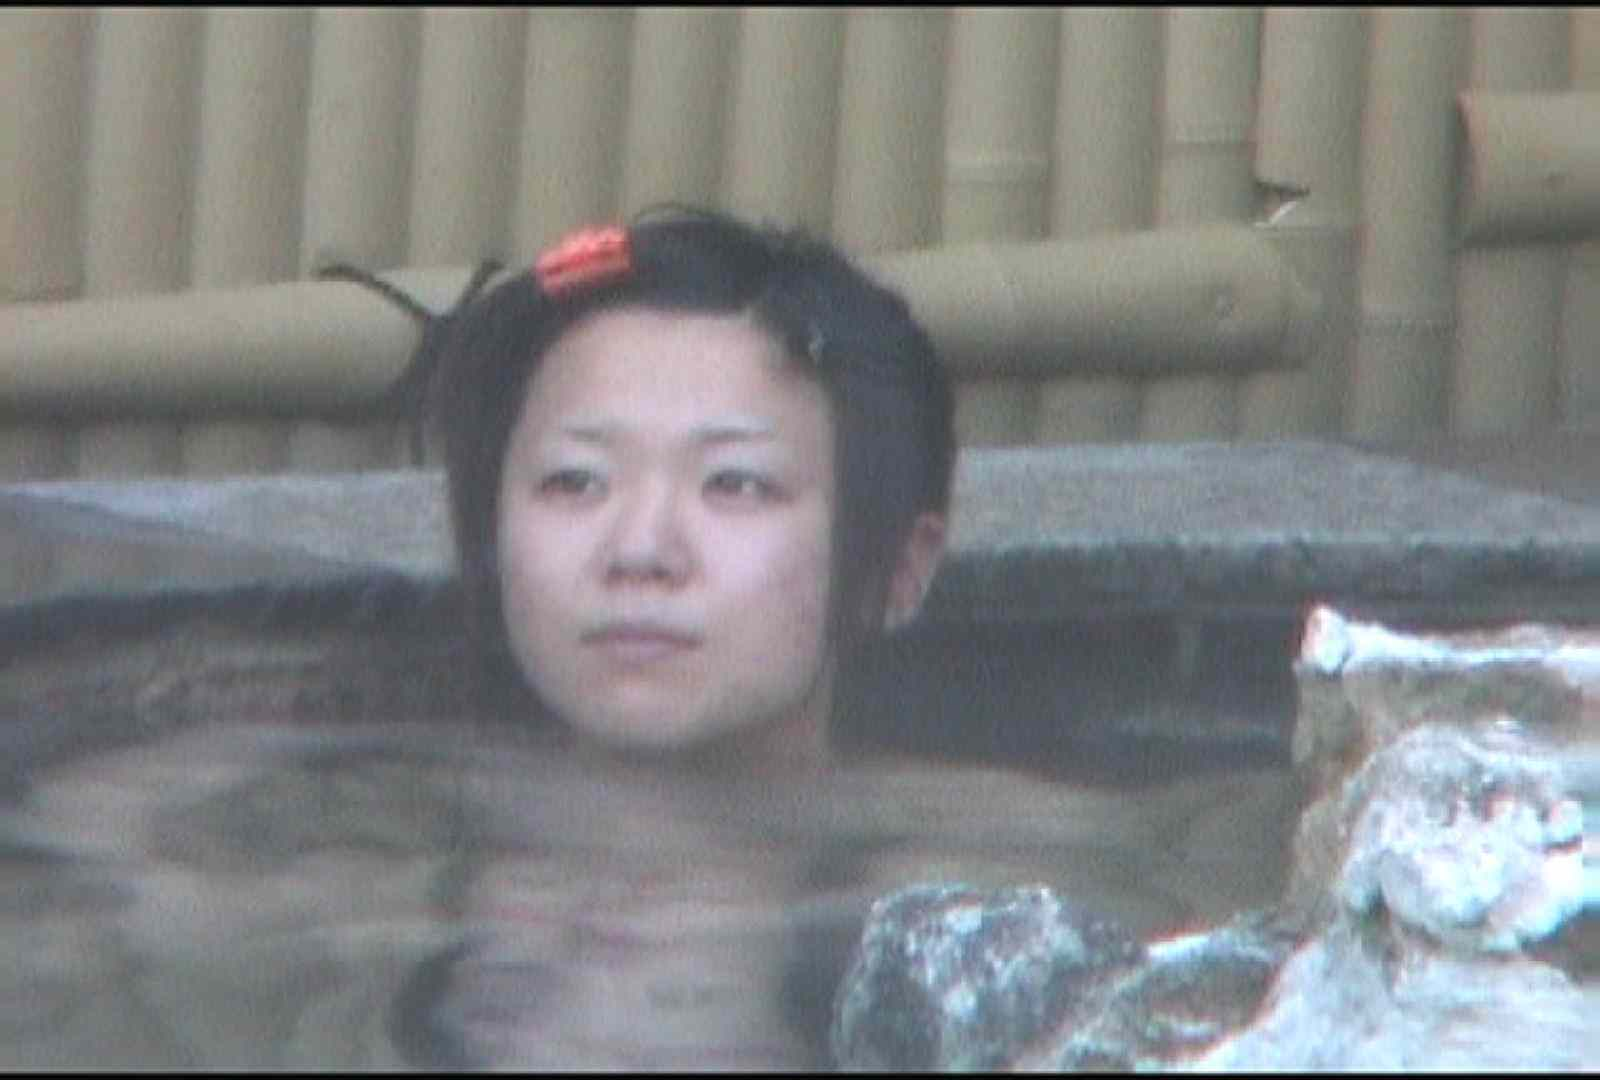 Aquaな露天風呂Vol.175 盗撮シリーズ | 露天風呂編  91PIX 41